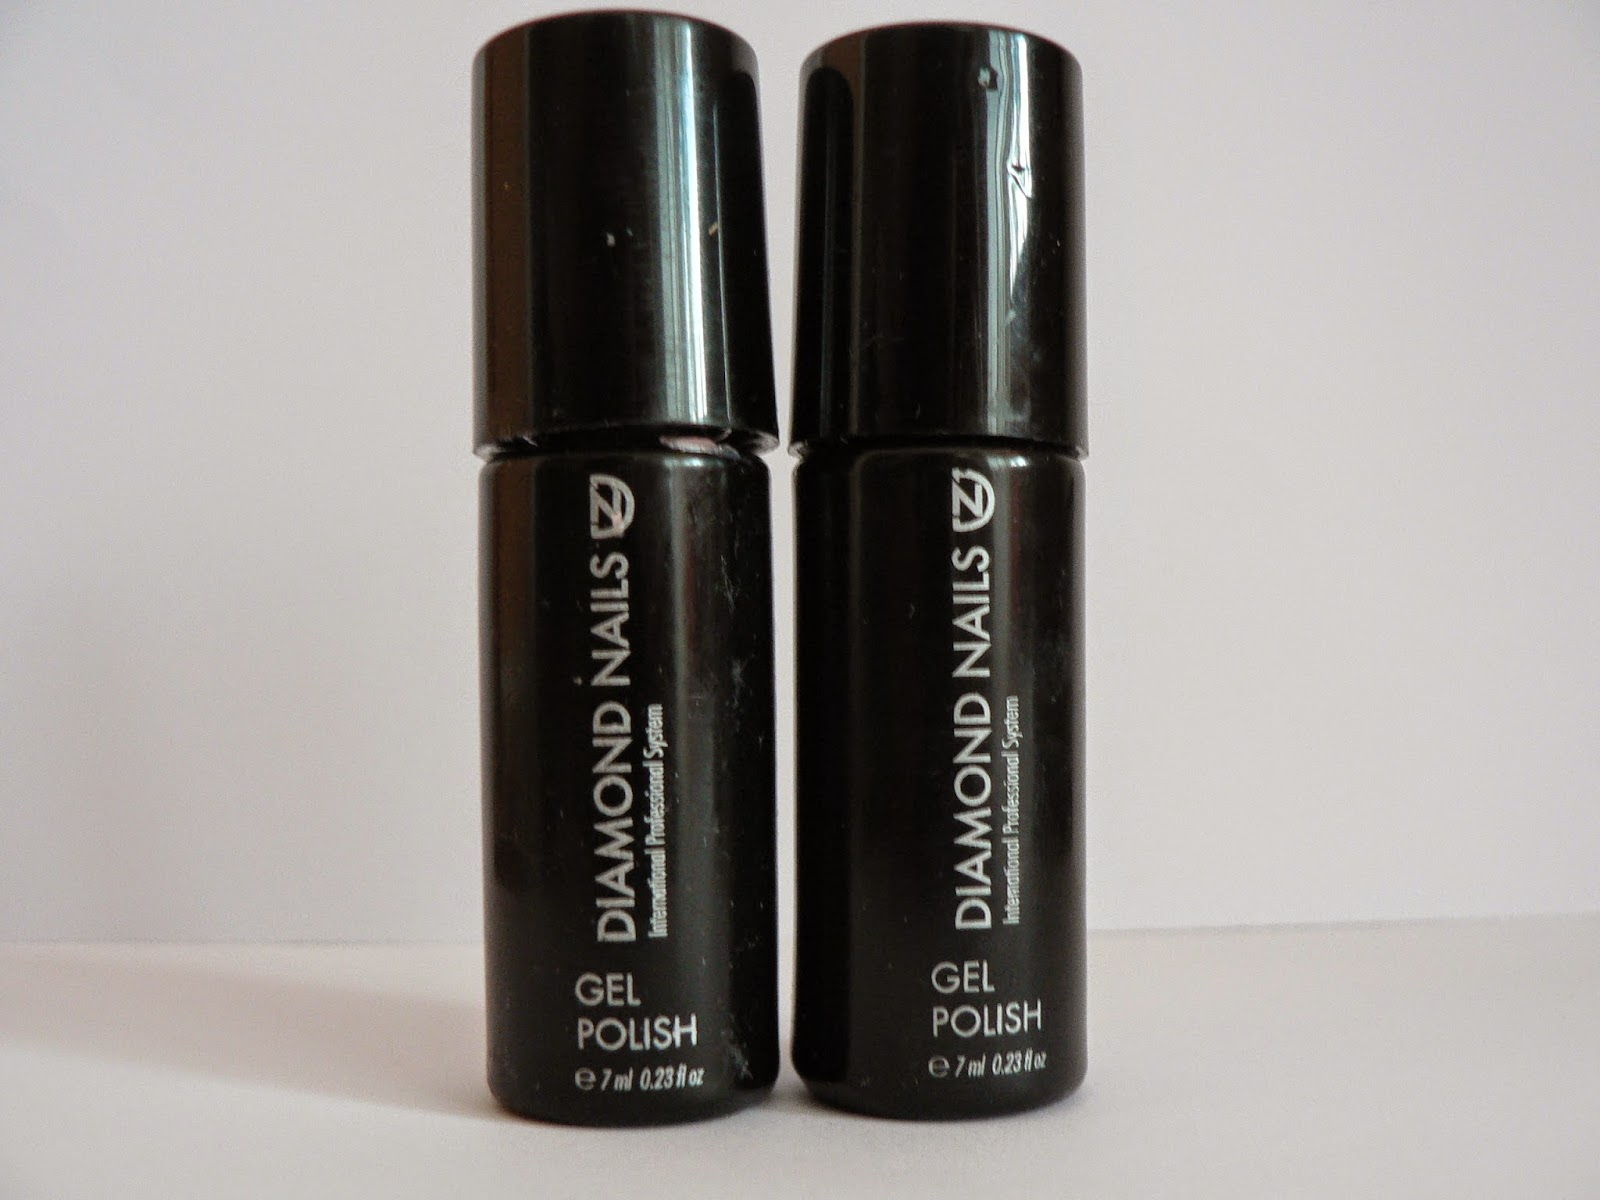 Diamond Nails Gel Polishes | Nail Polish Obsessed